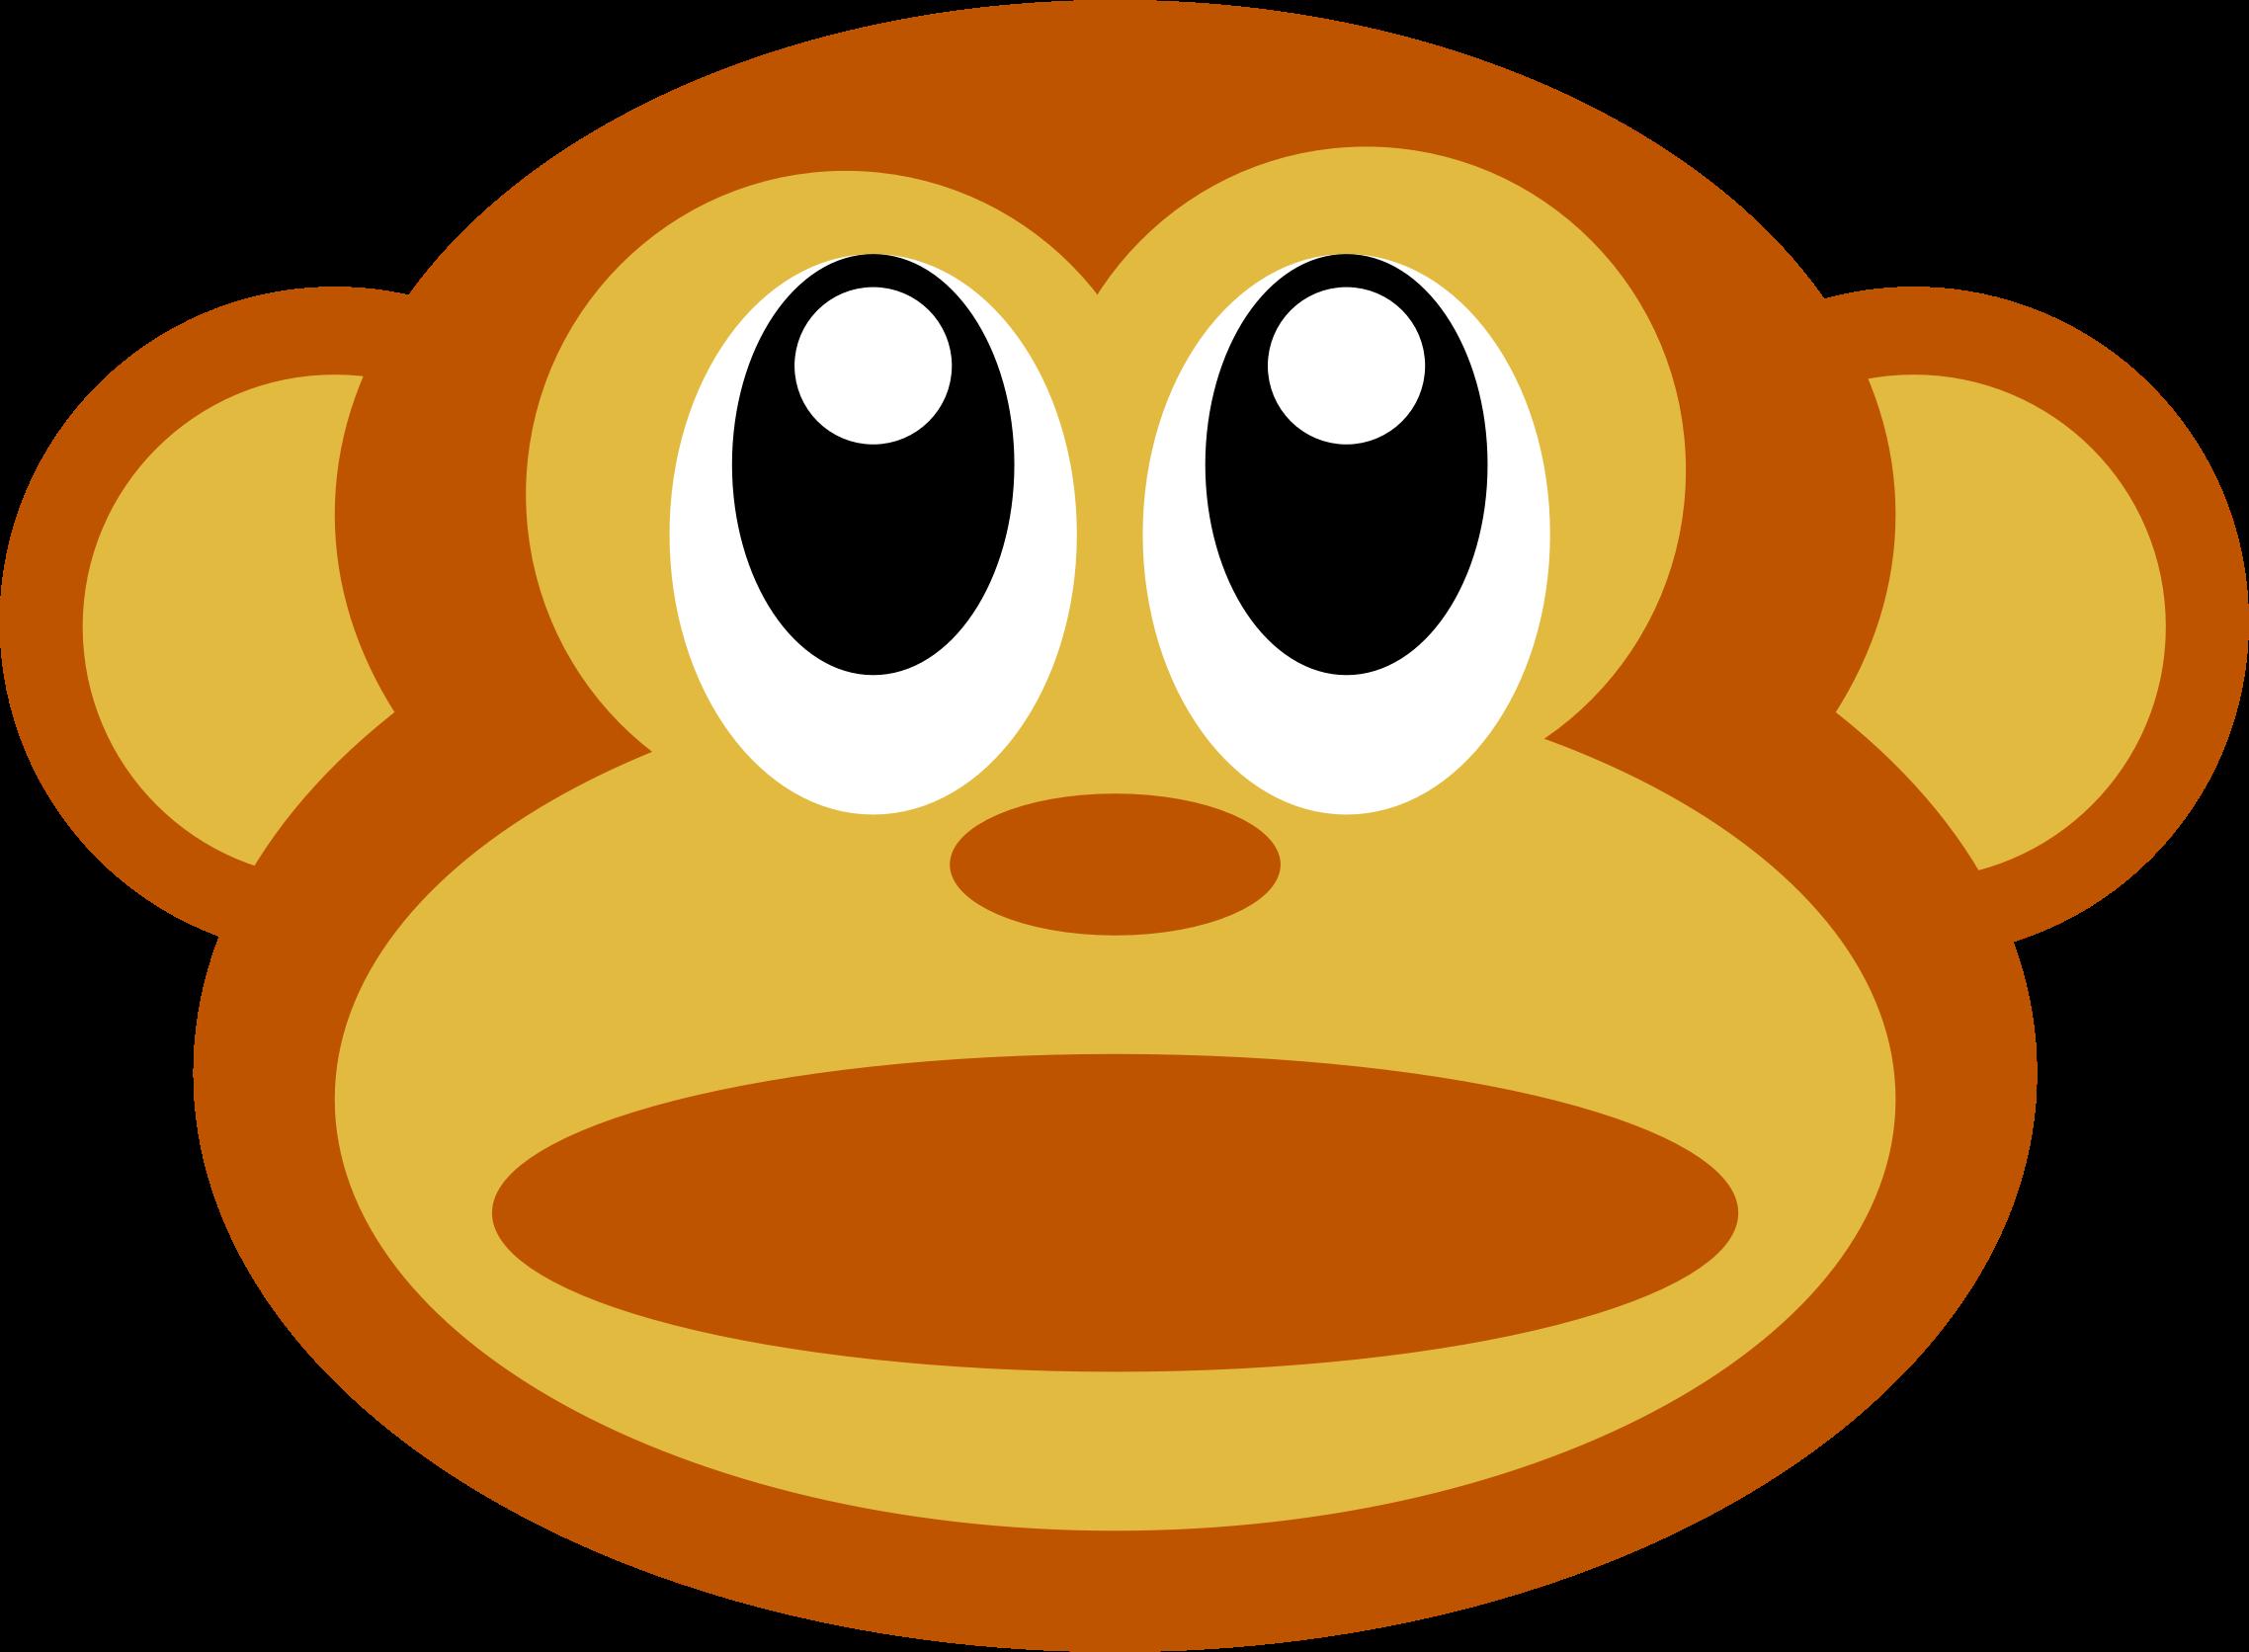 Monkey free download best. Clipart face leopard